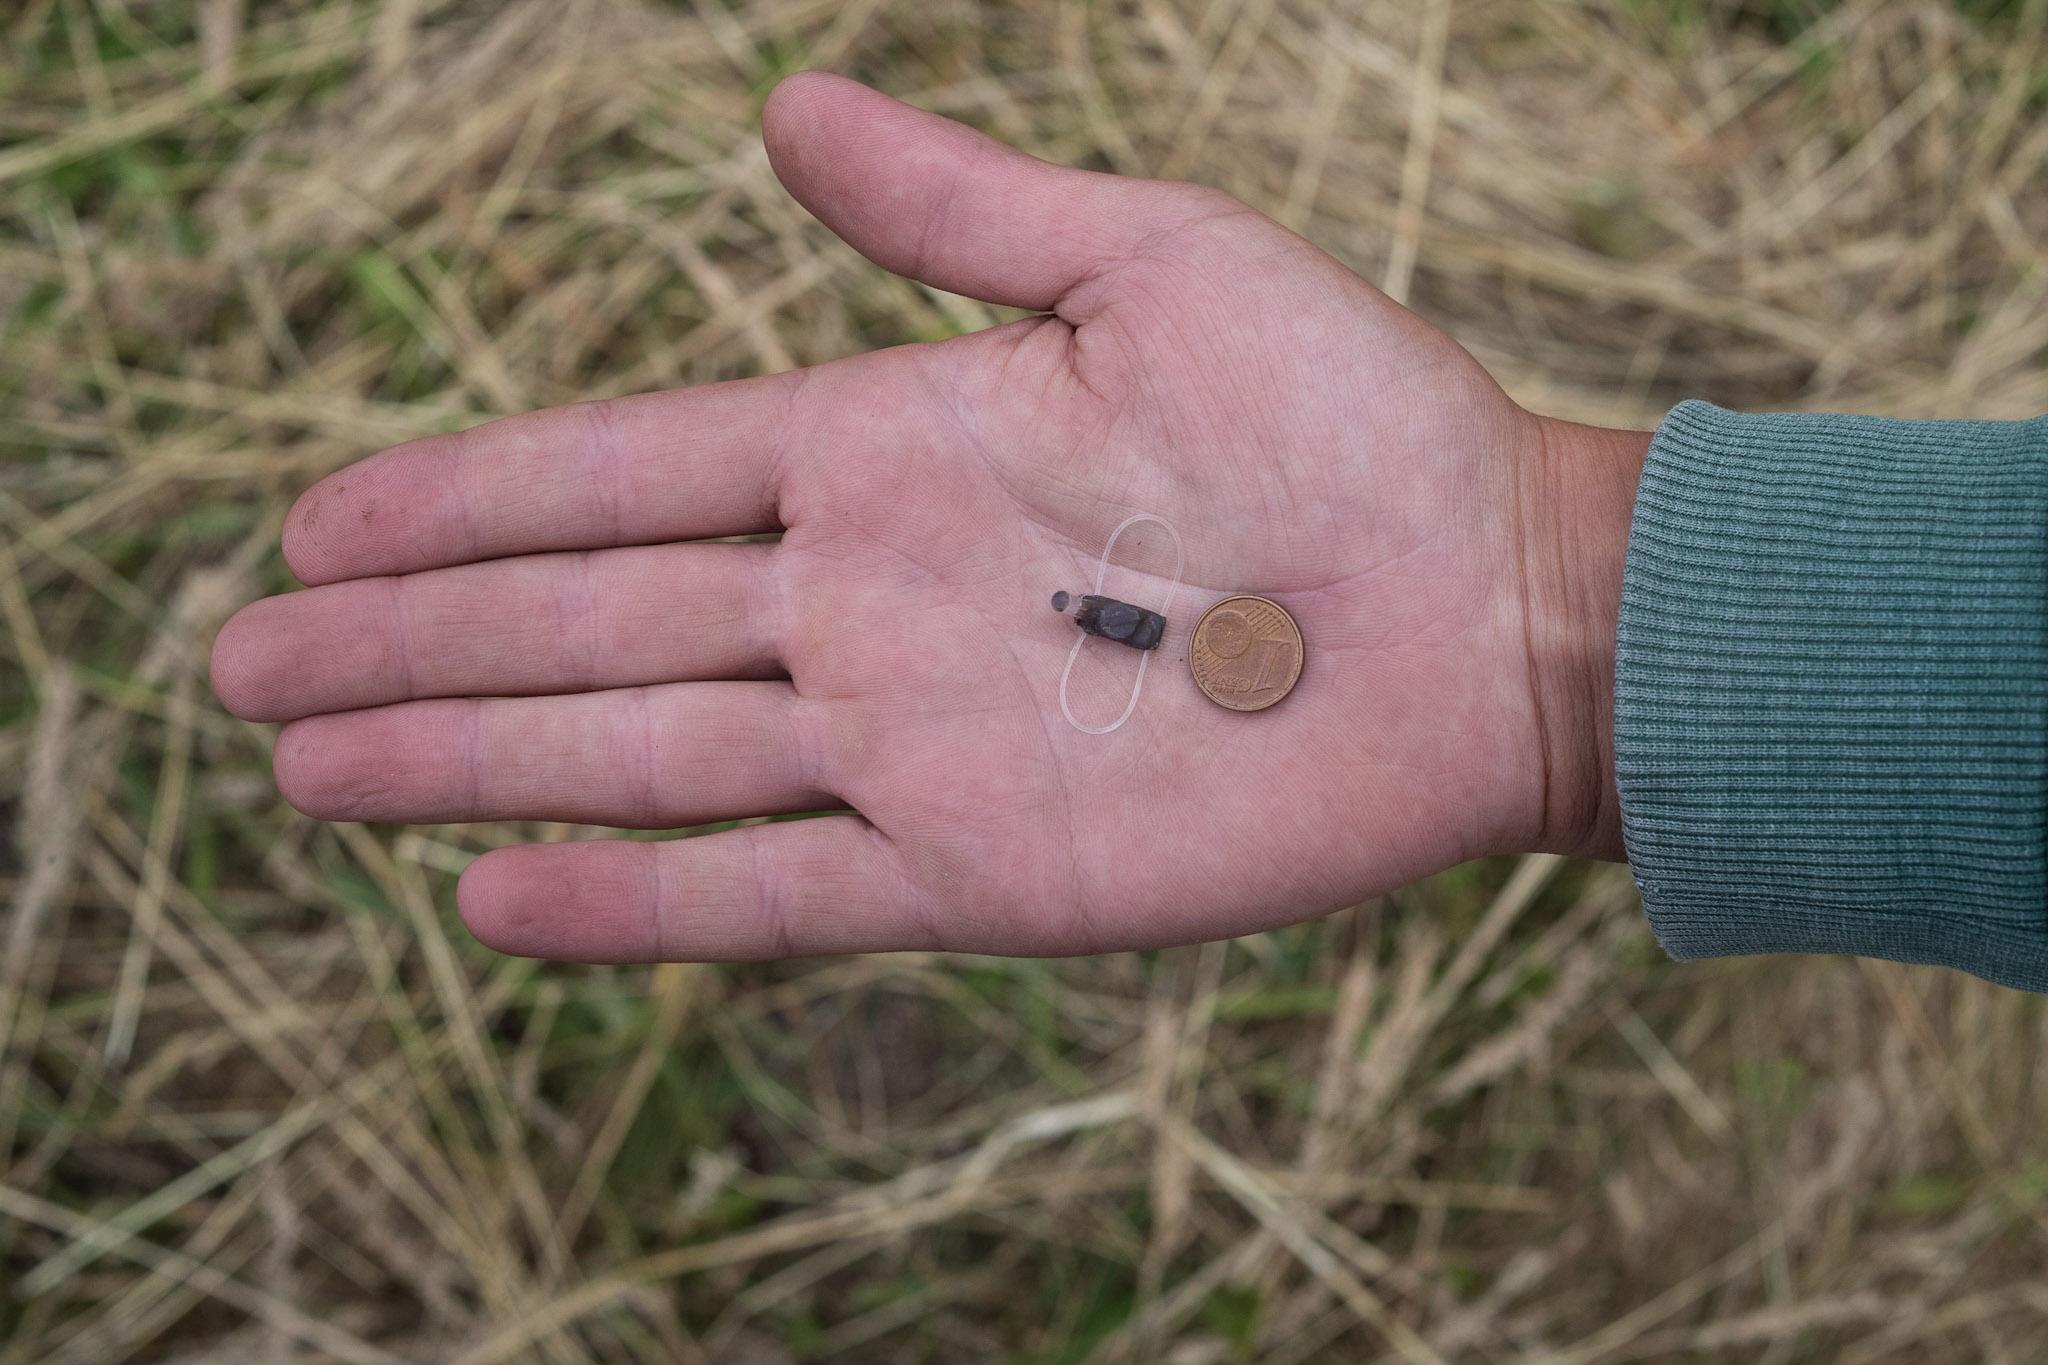 Geolokatorius ir 1 euro cento moneta